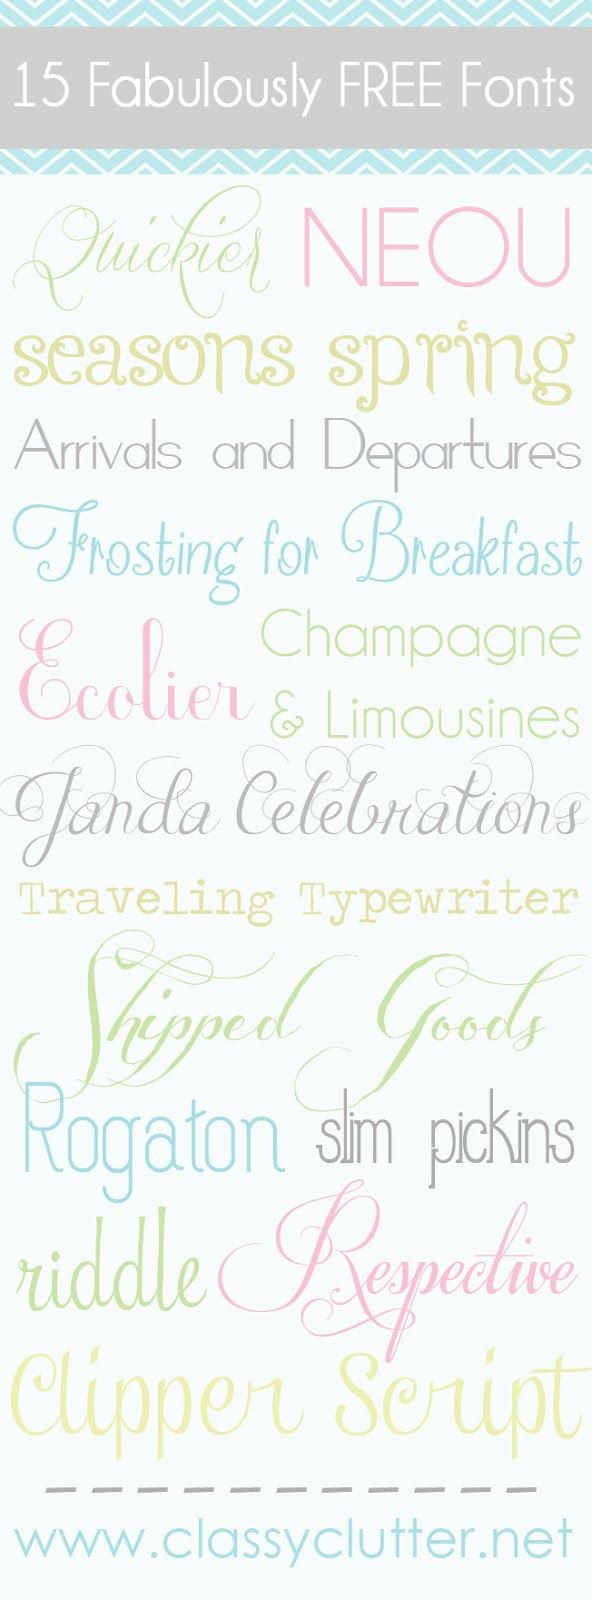 15 Fabulously FREE Fonts